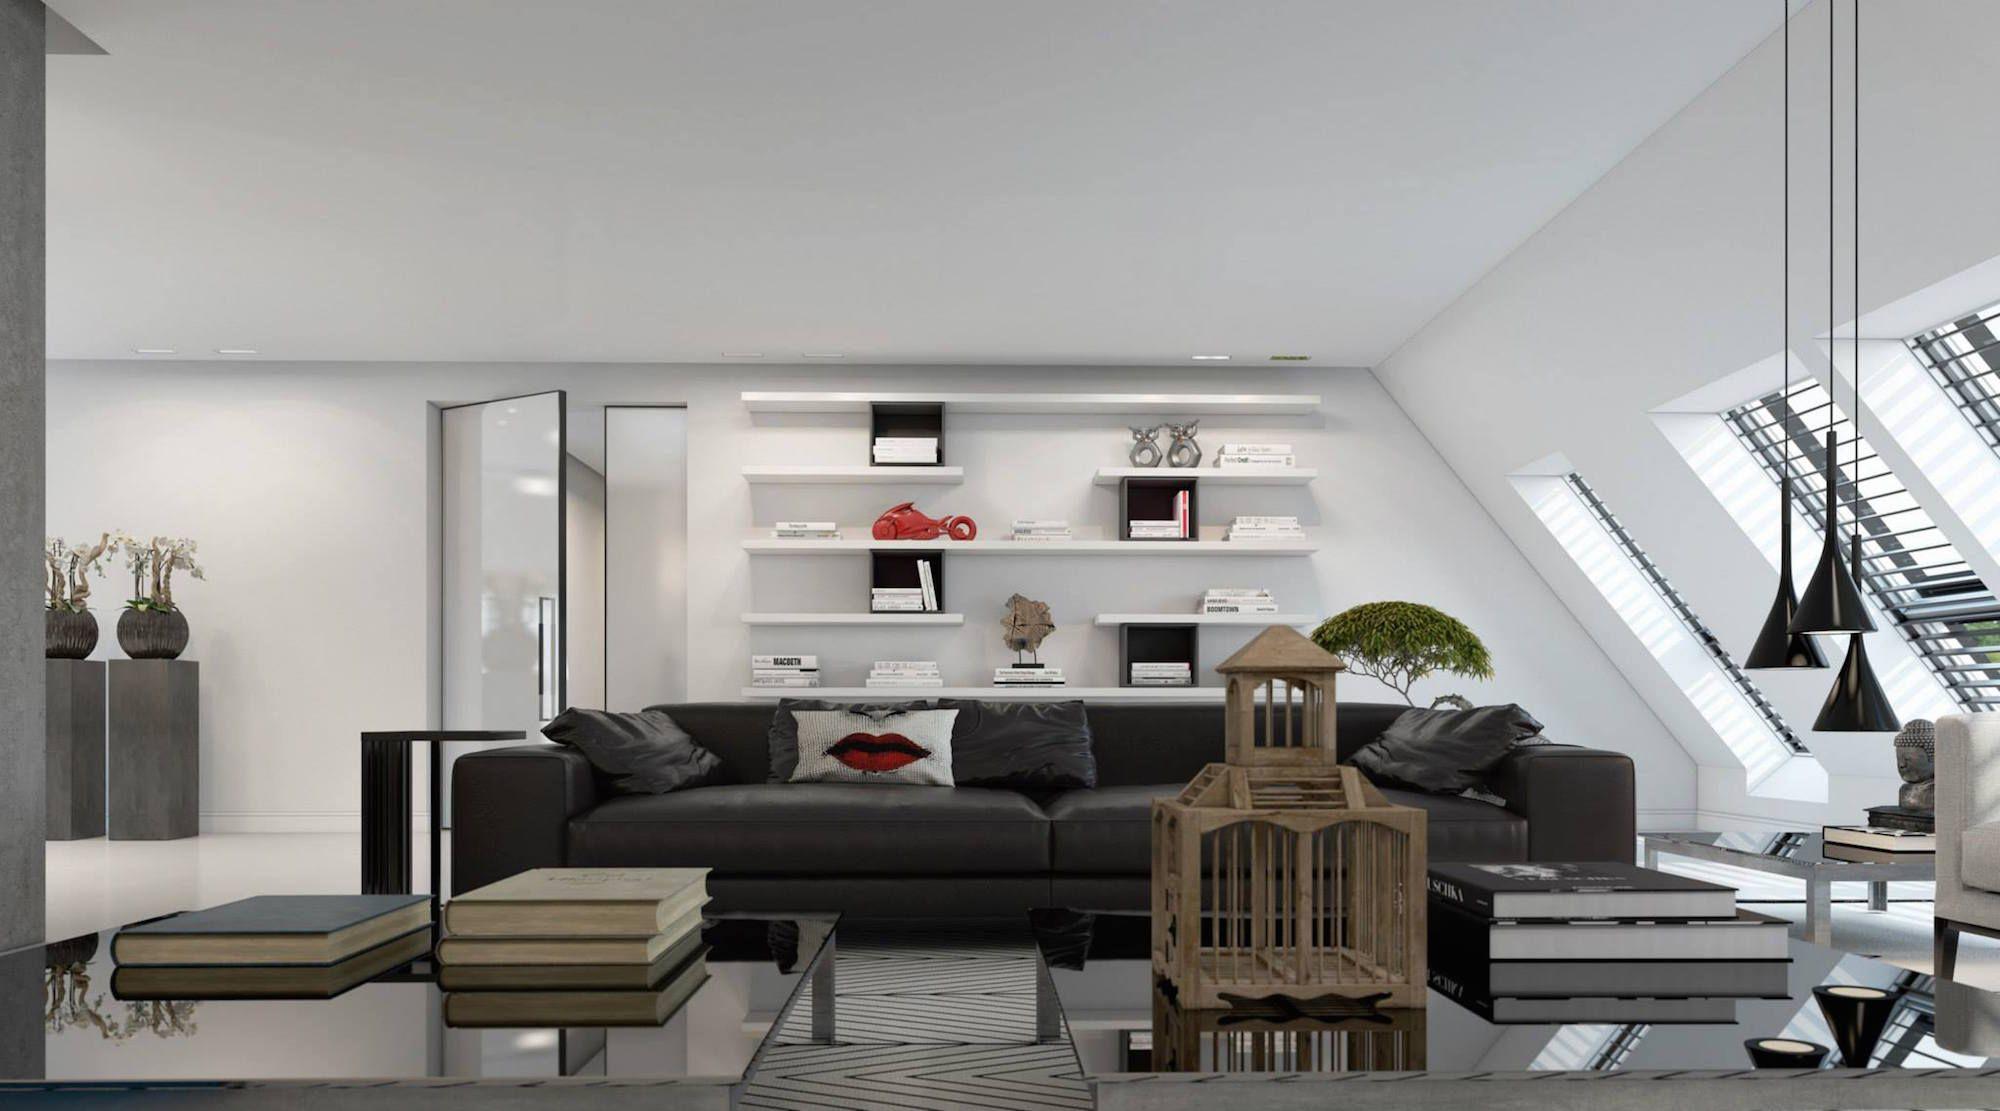 Ultramodern Dusseldorf Penthouse Design-04